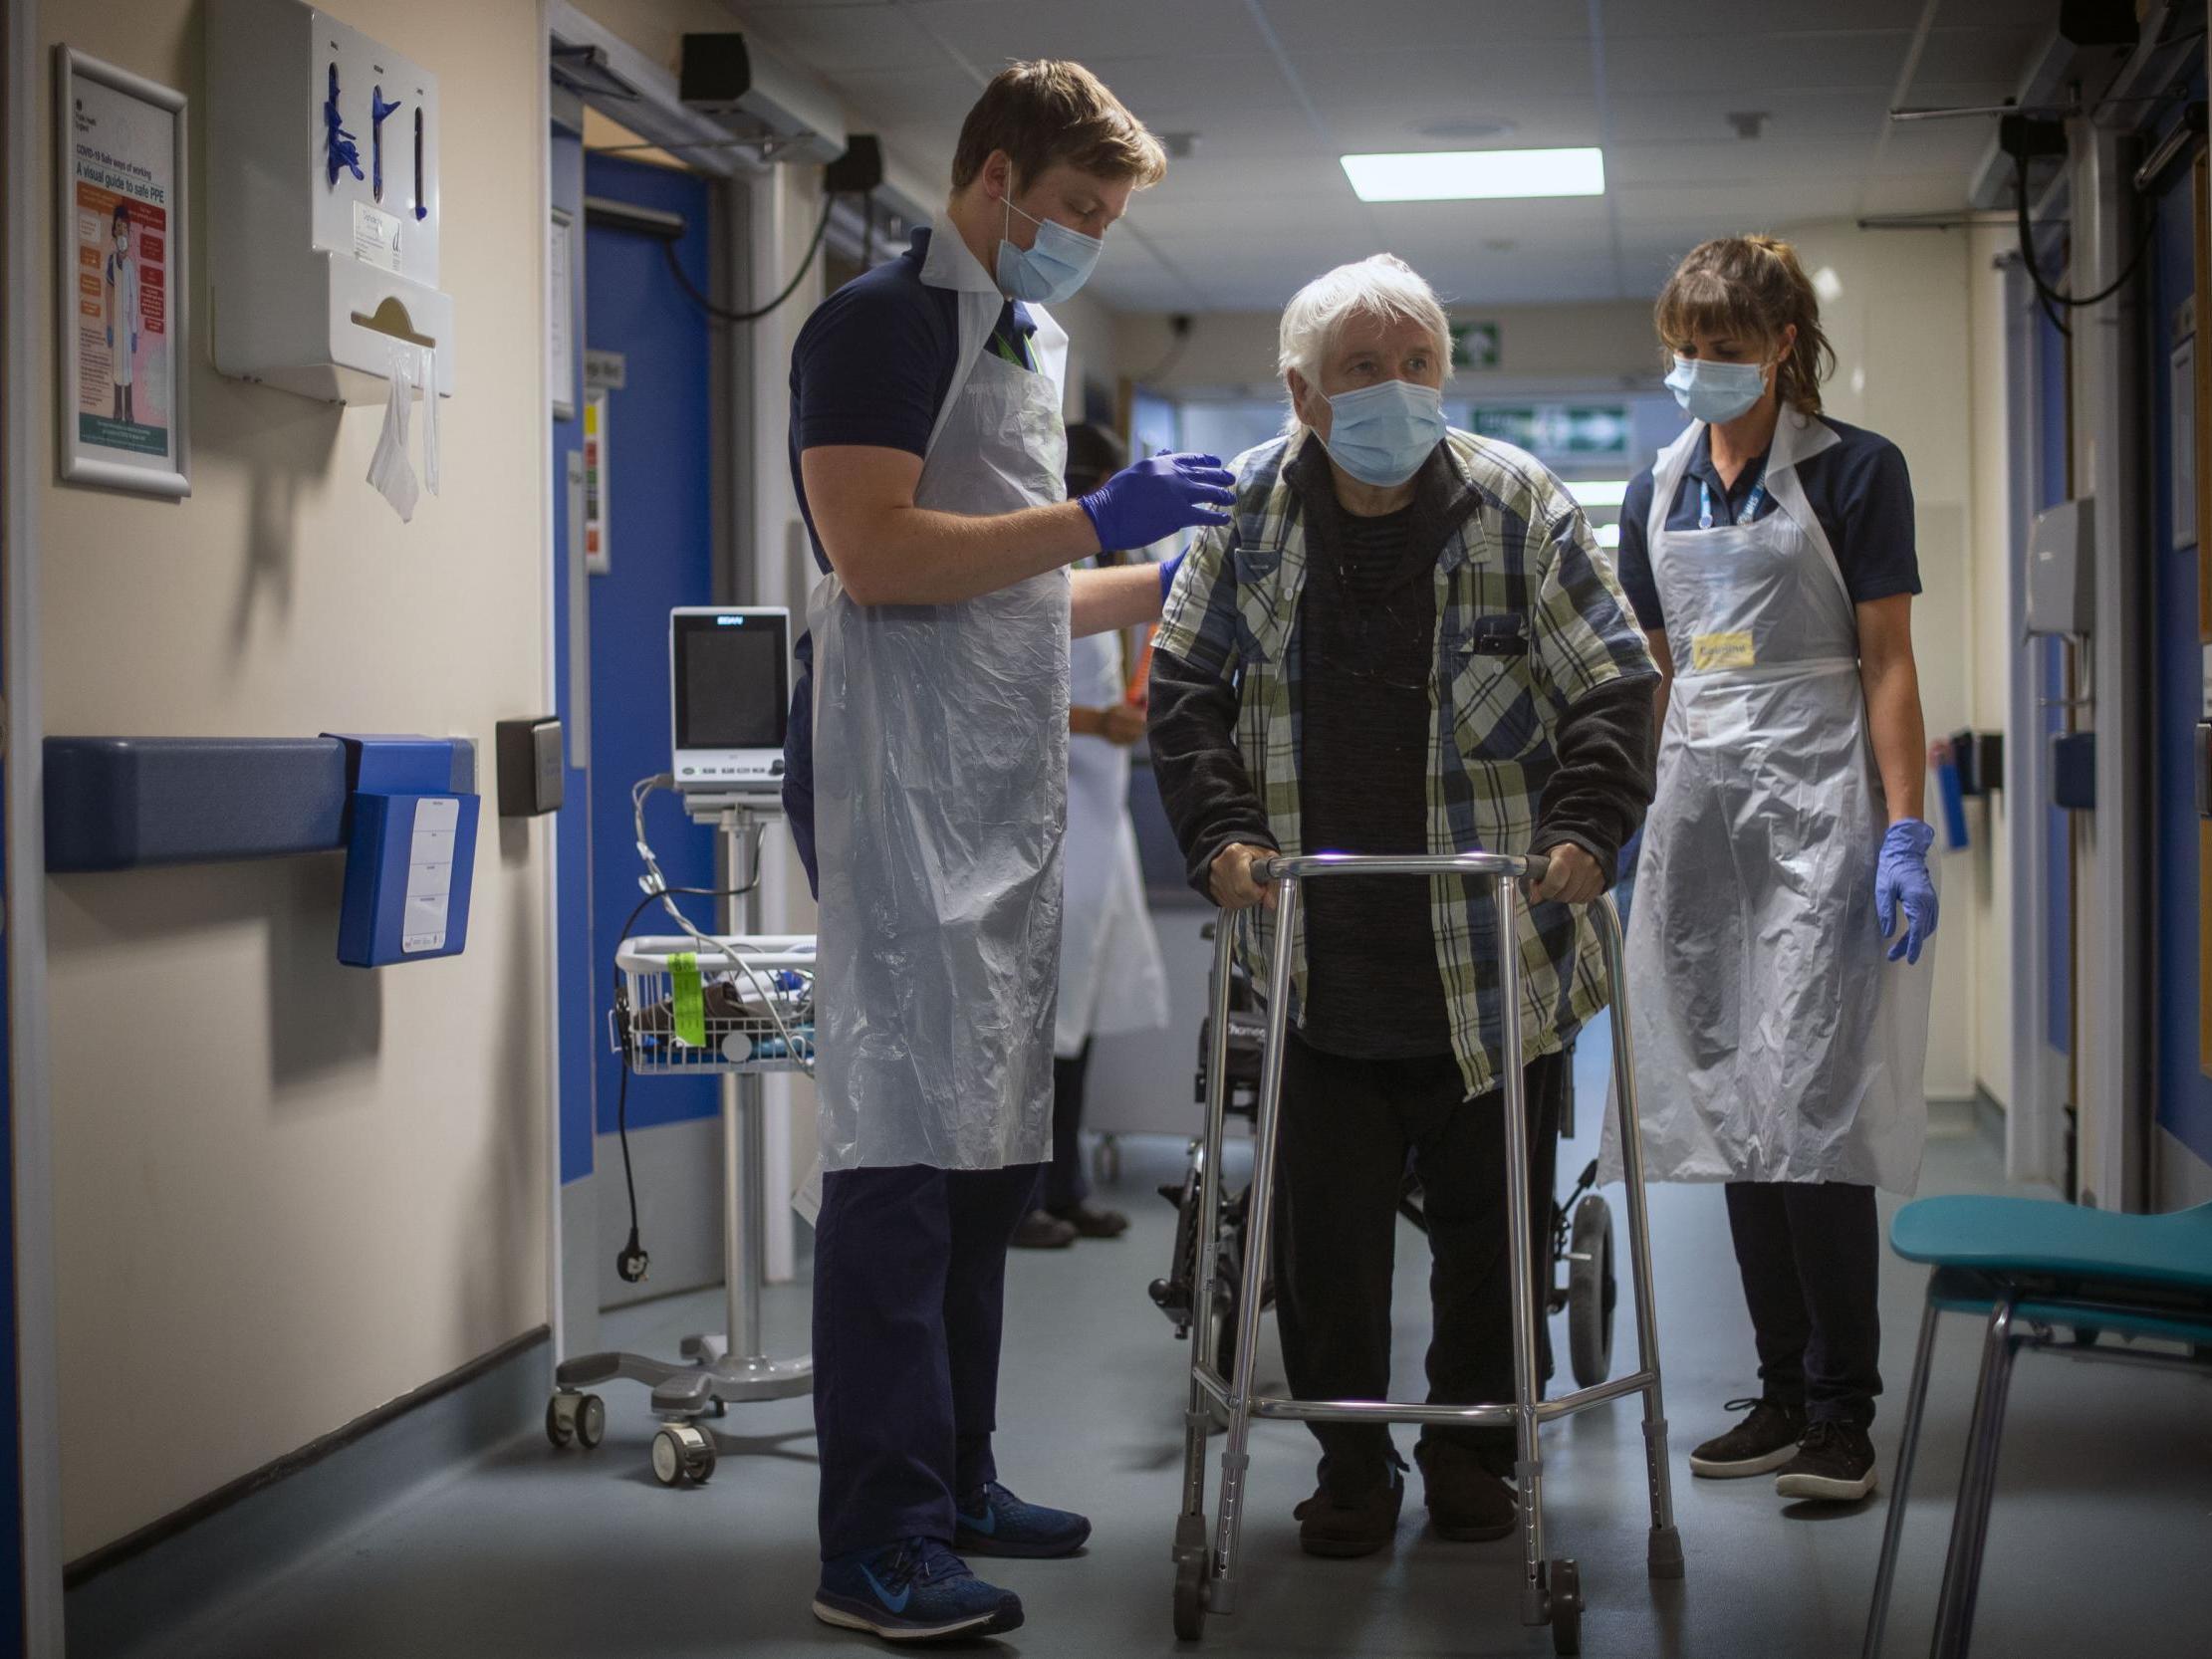 Coronavirus; Hospitals face 'hard choices' as routine NHS services restart, expert says thumbnail